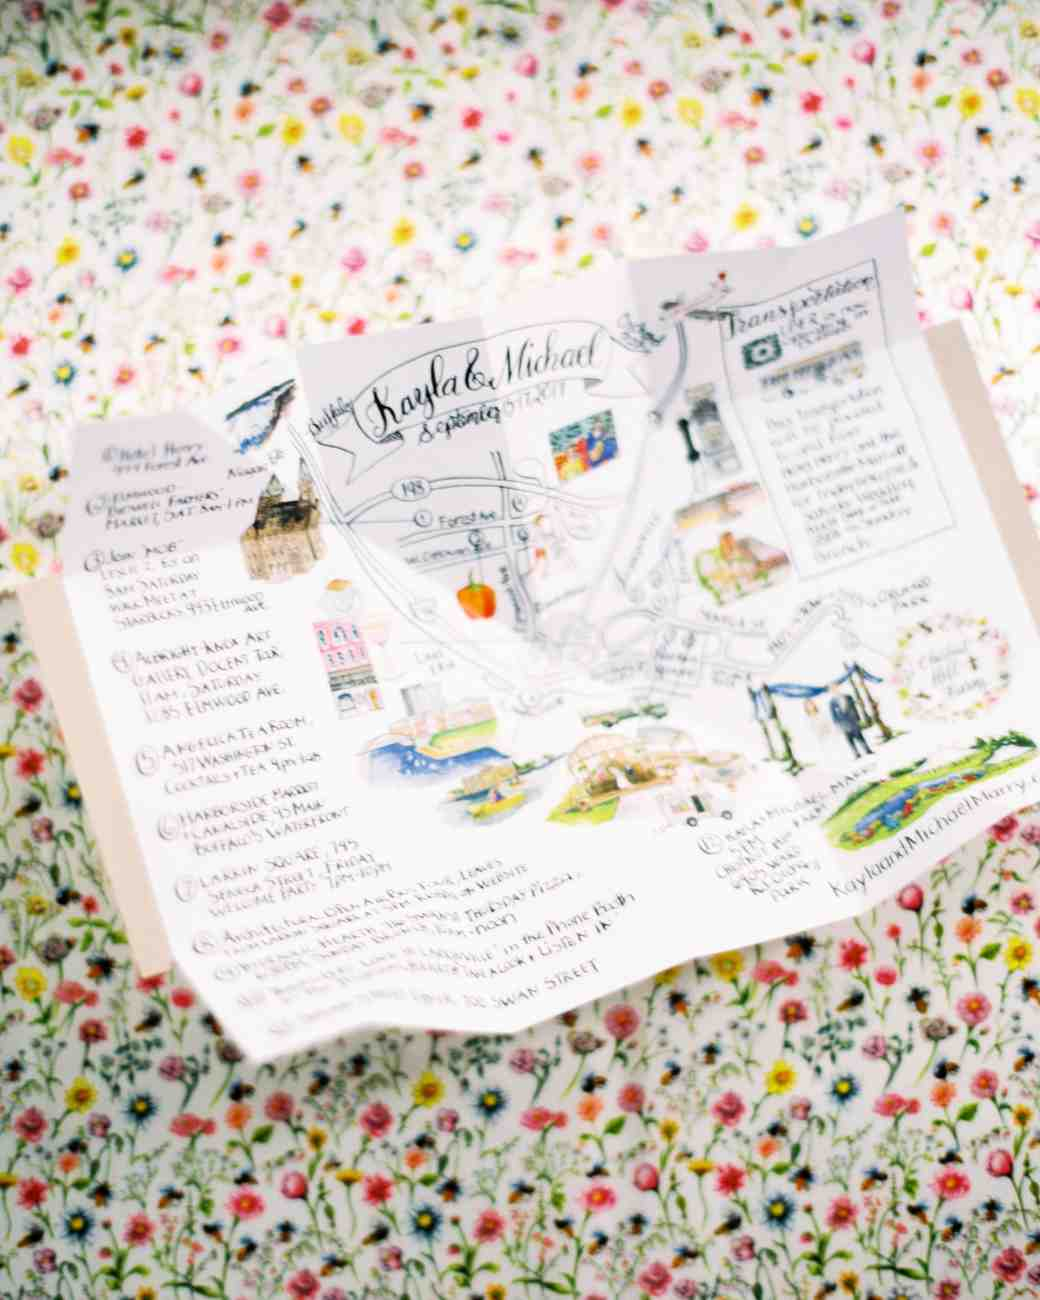 kayla michael wedding map